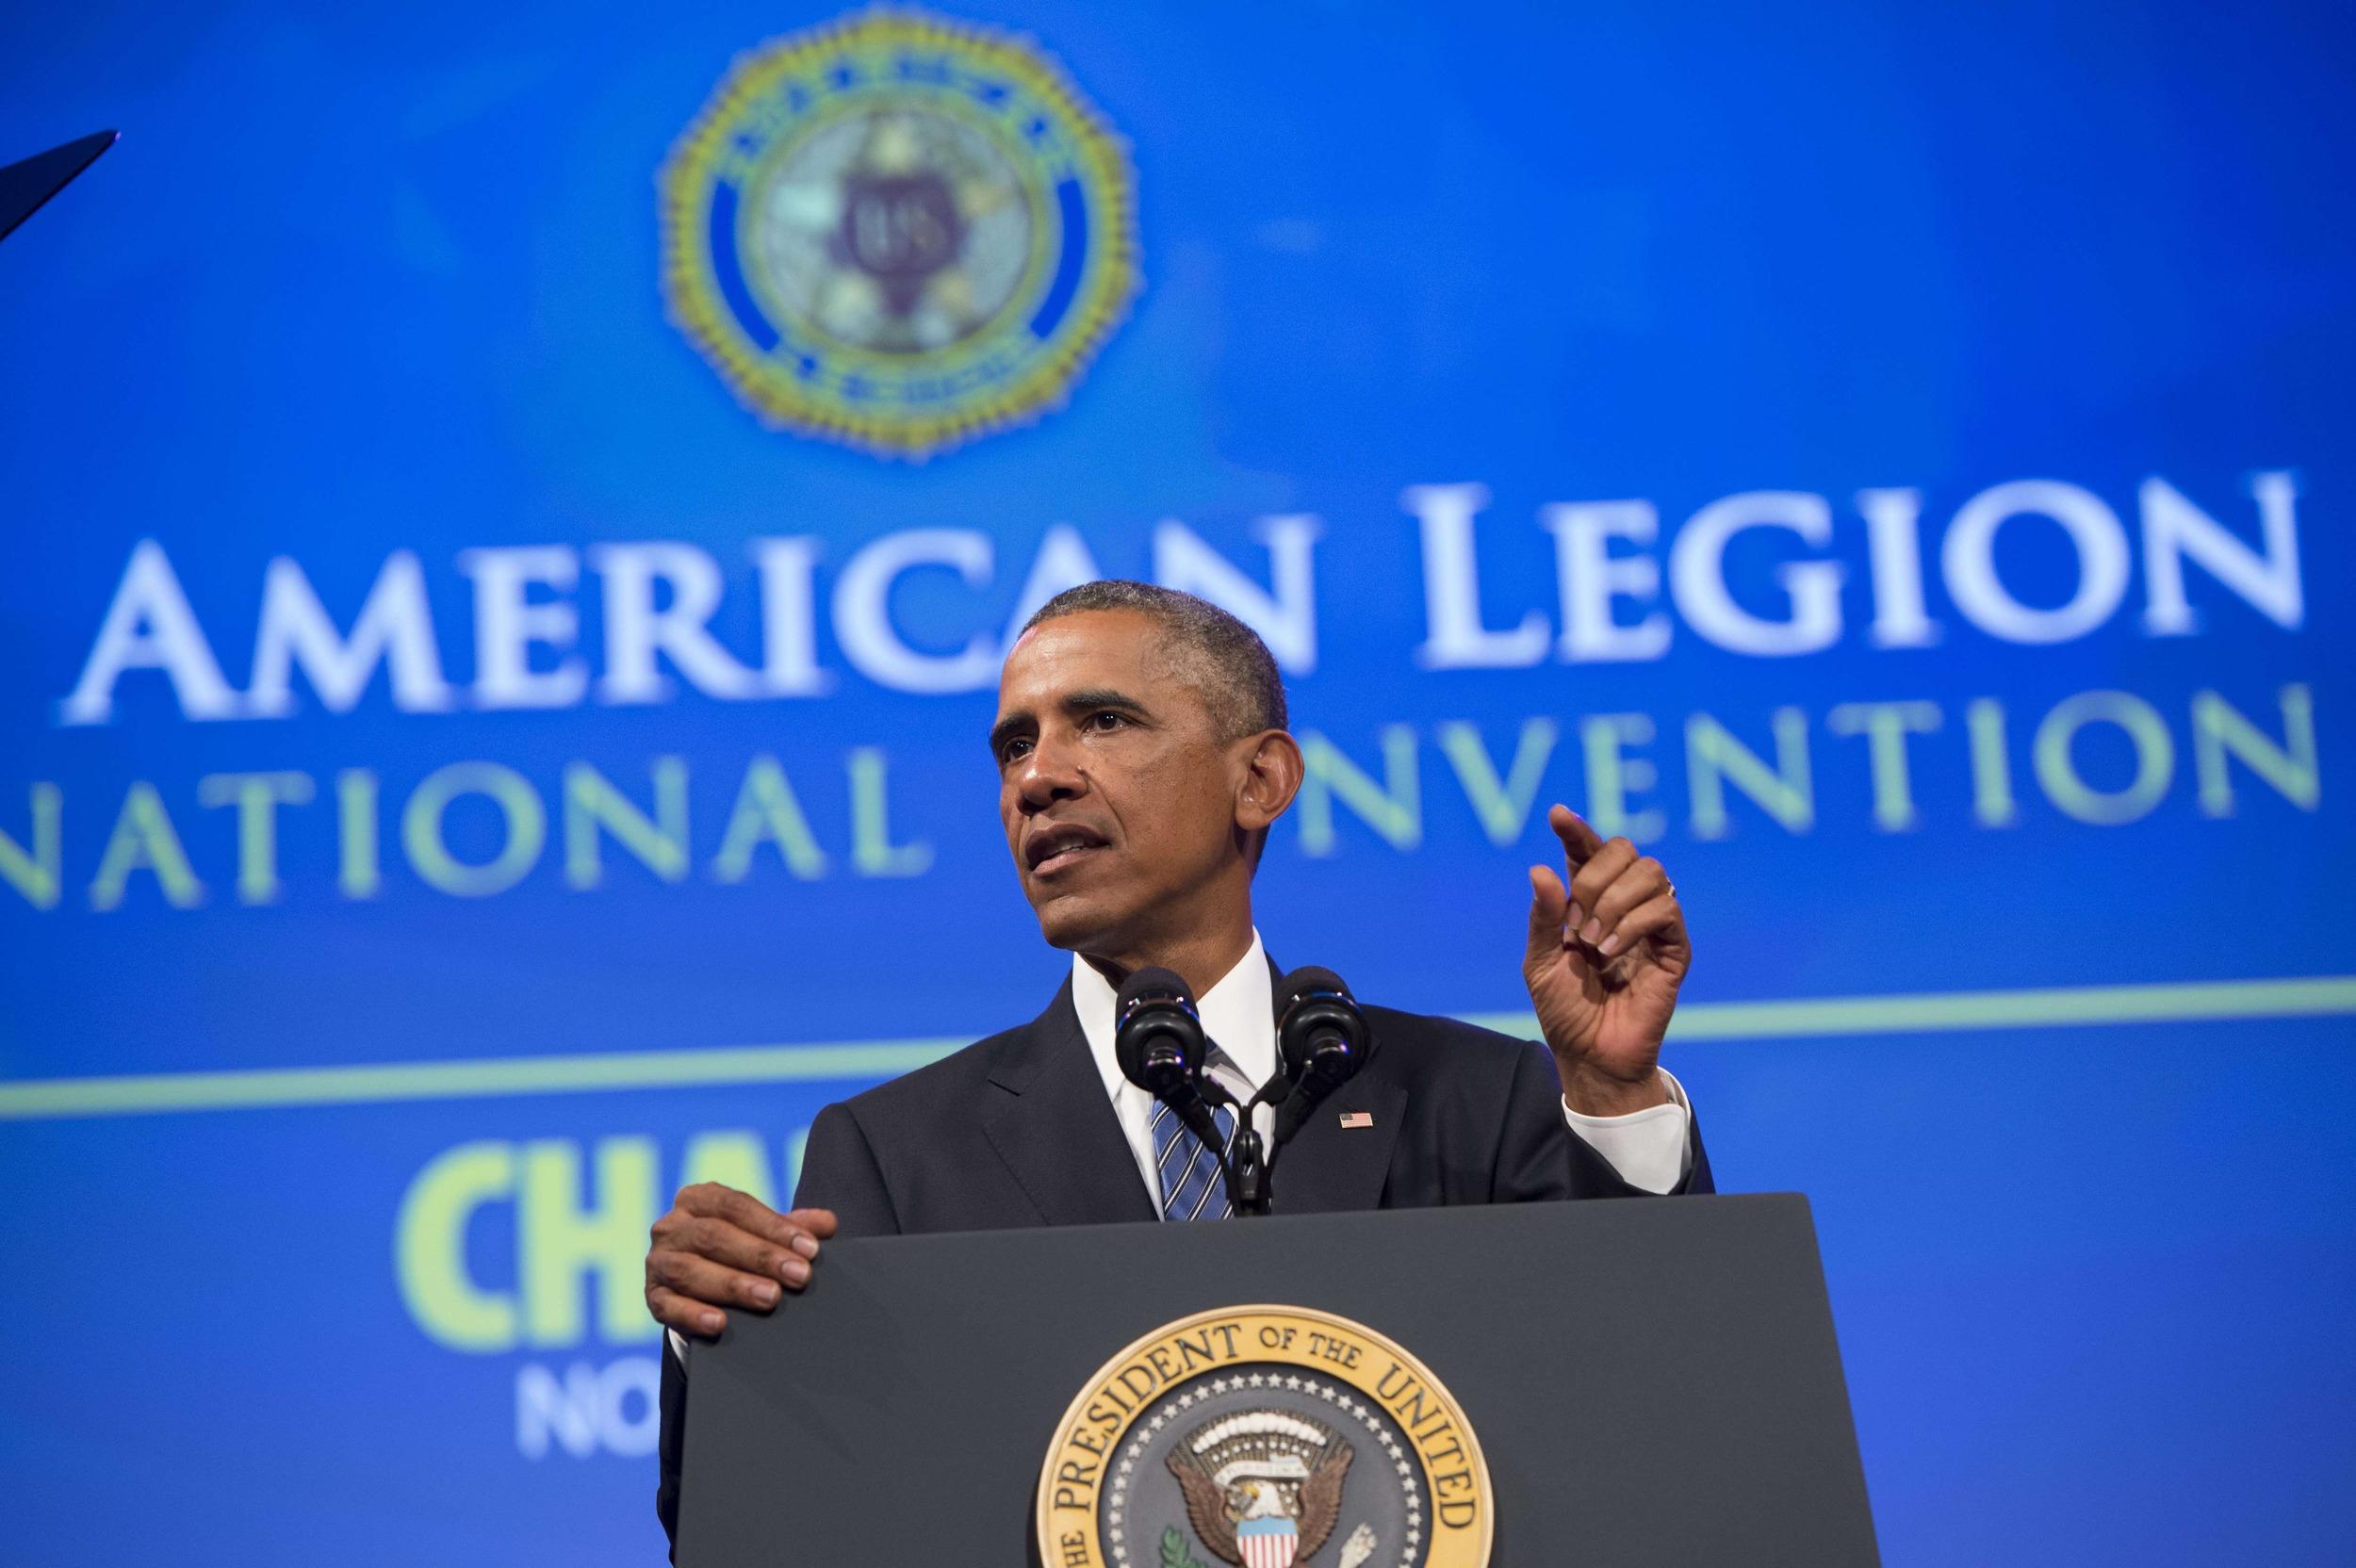 Image: US-POLITICS-OBAMA-AMERICAN-LEGION